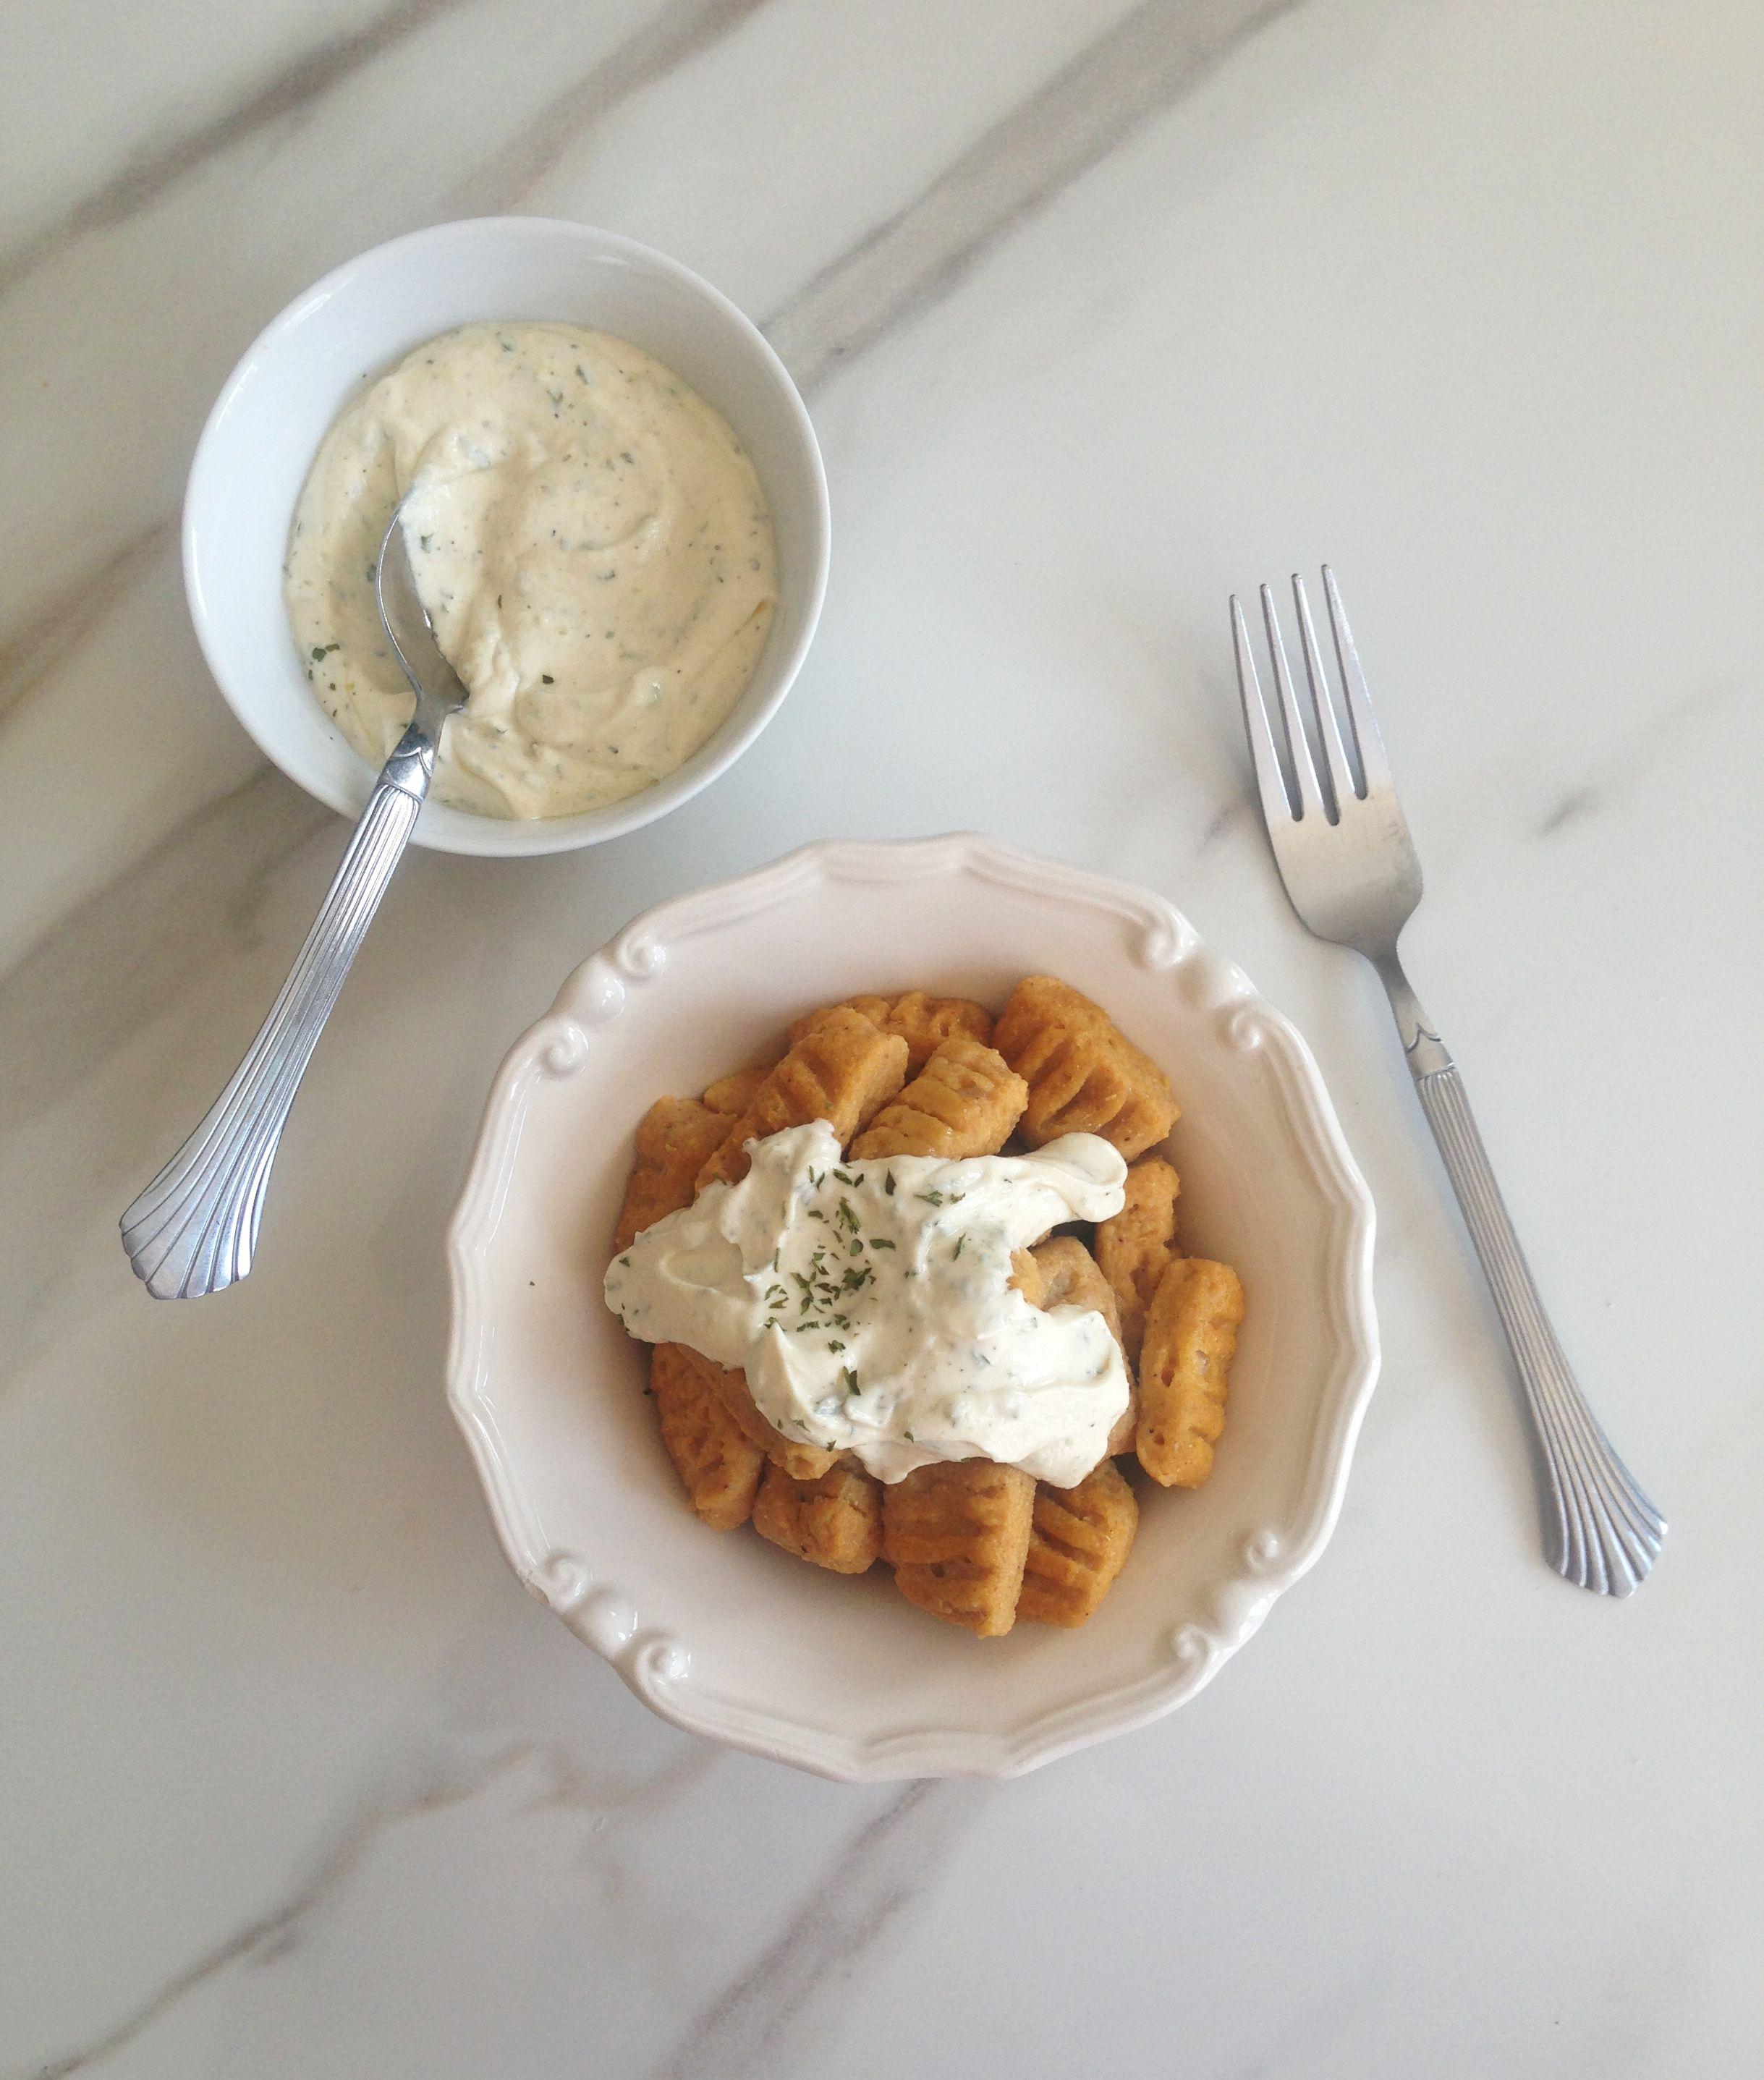 Homemade Pumpkin Parmesan Gnocchi with Goat Cheese Garlic Sauce Recipe